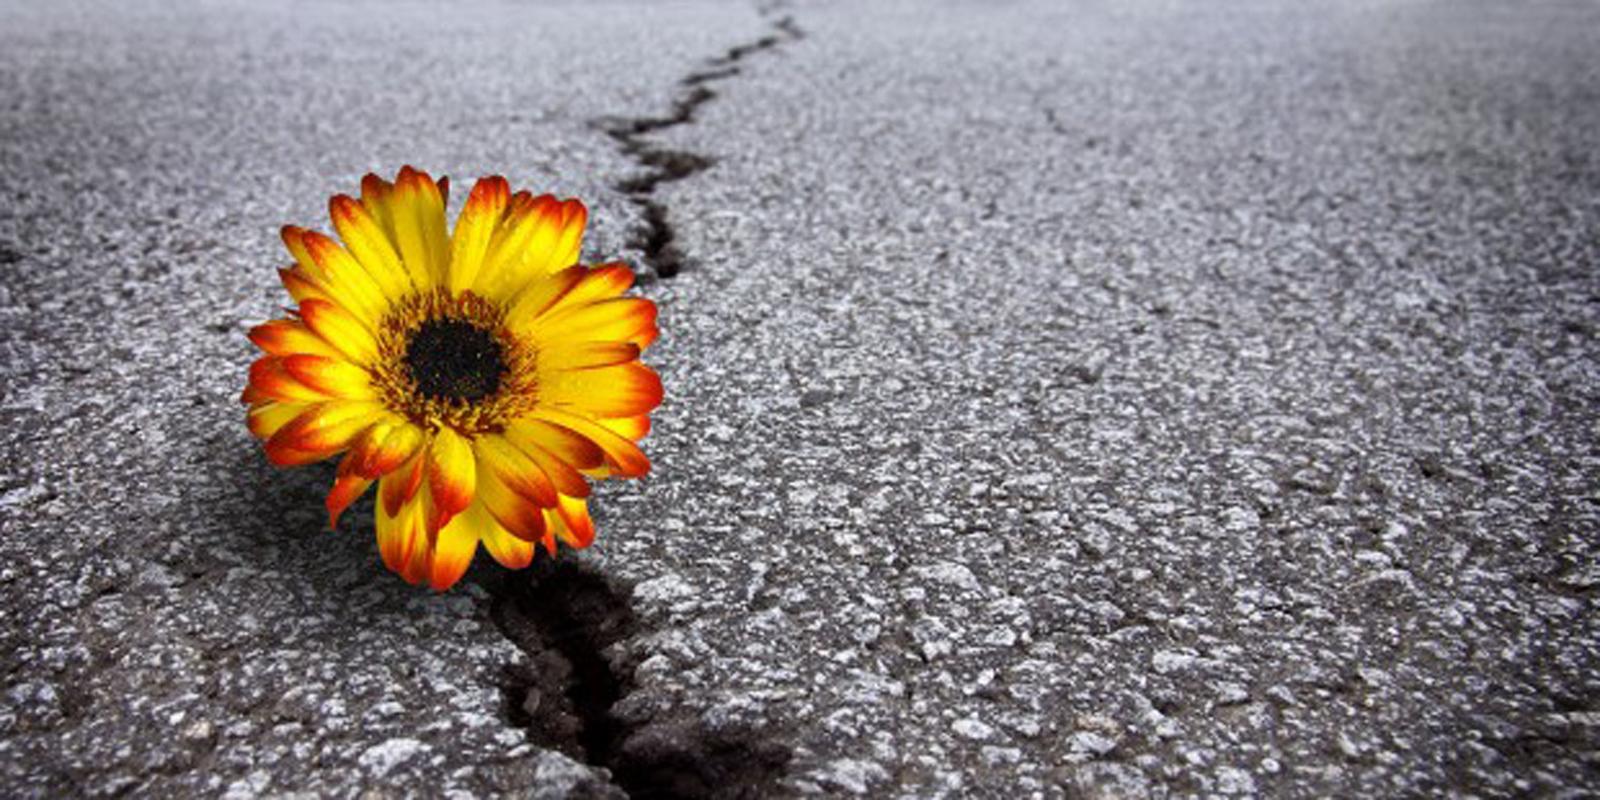 Adapting After Adversity